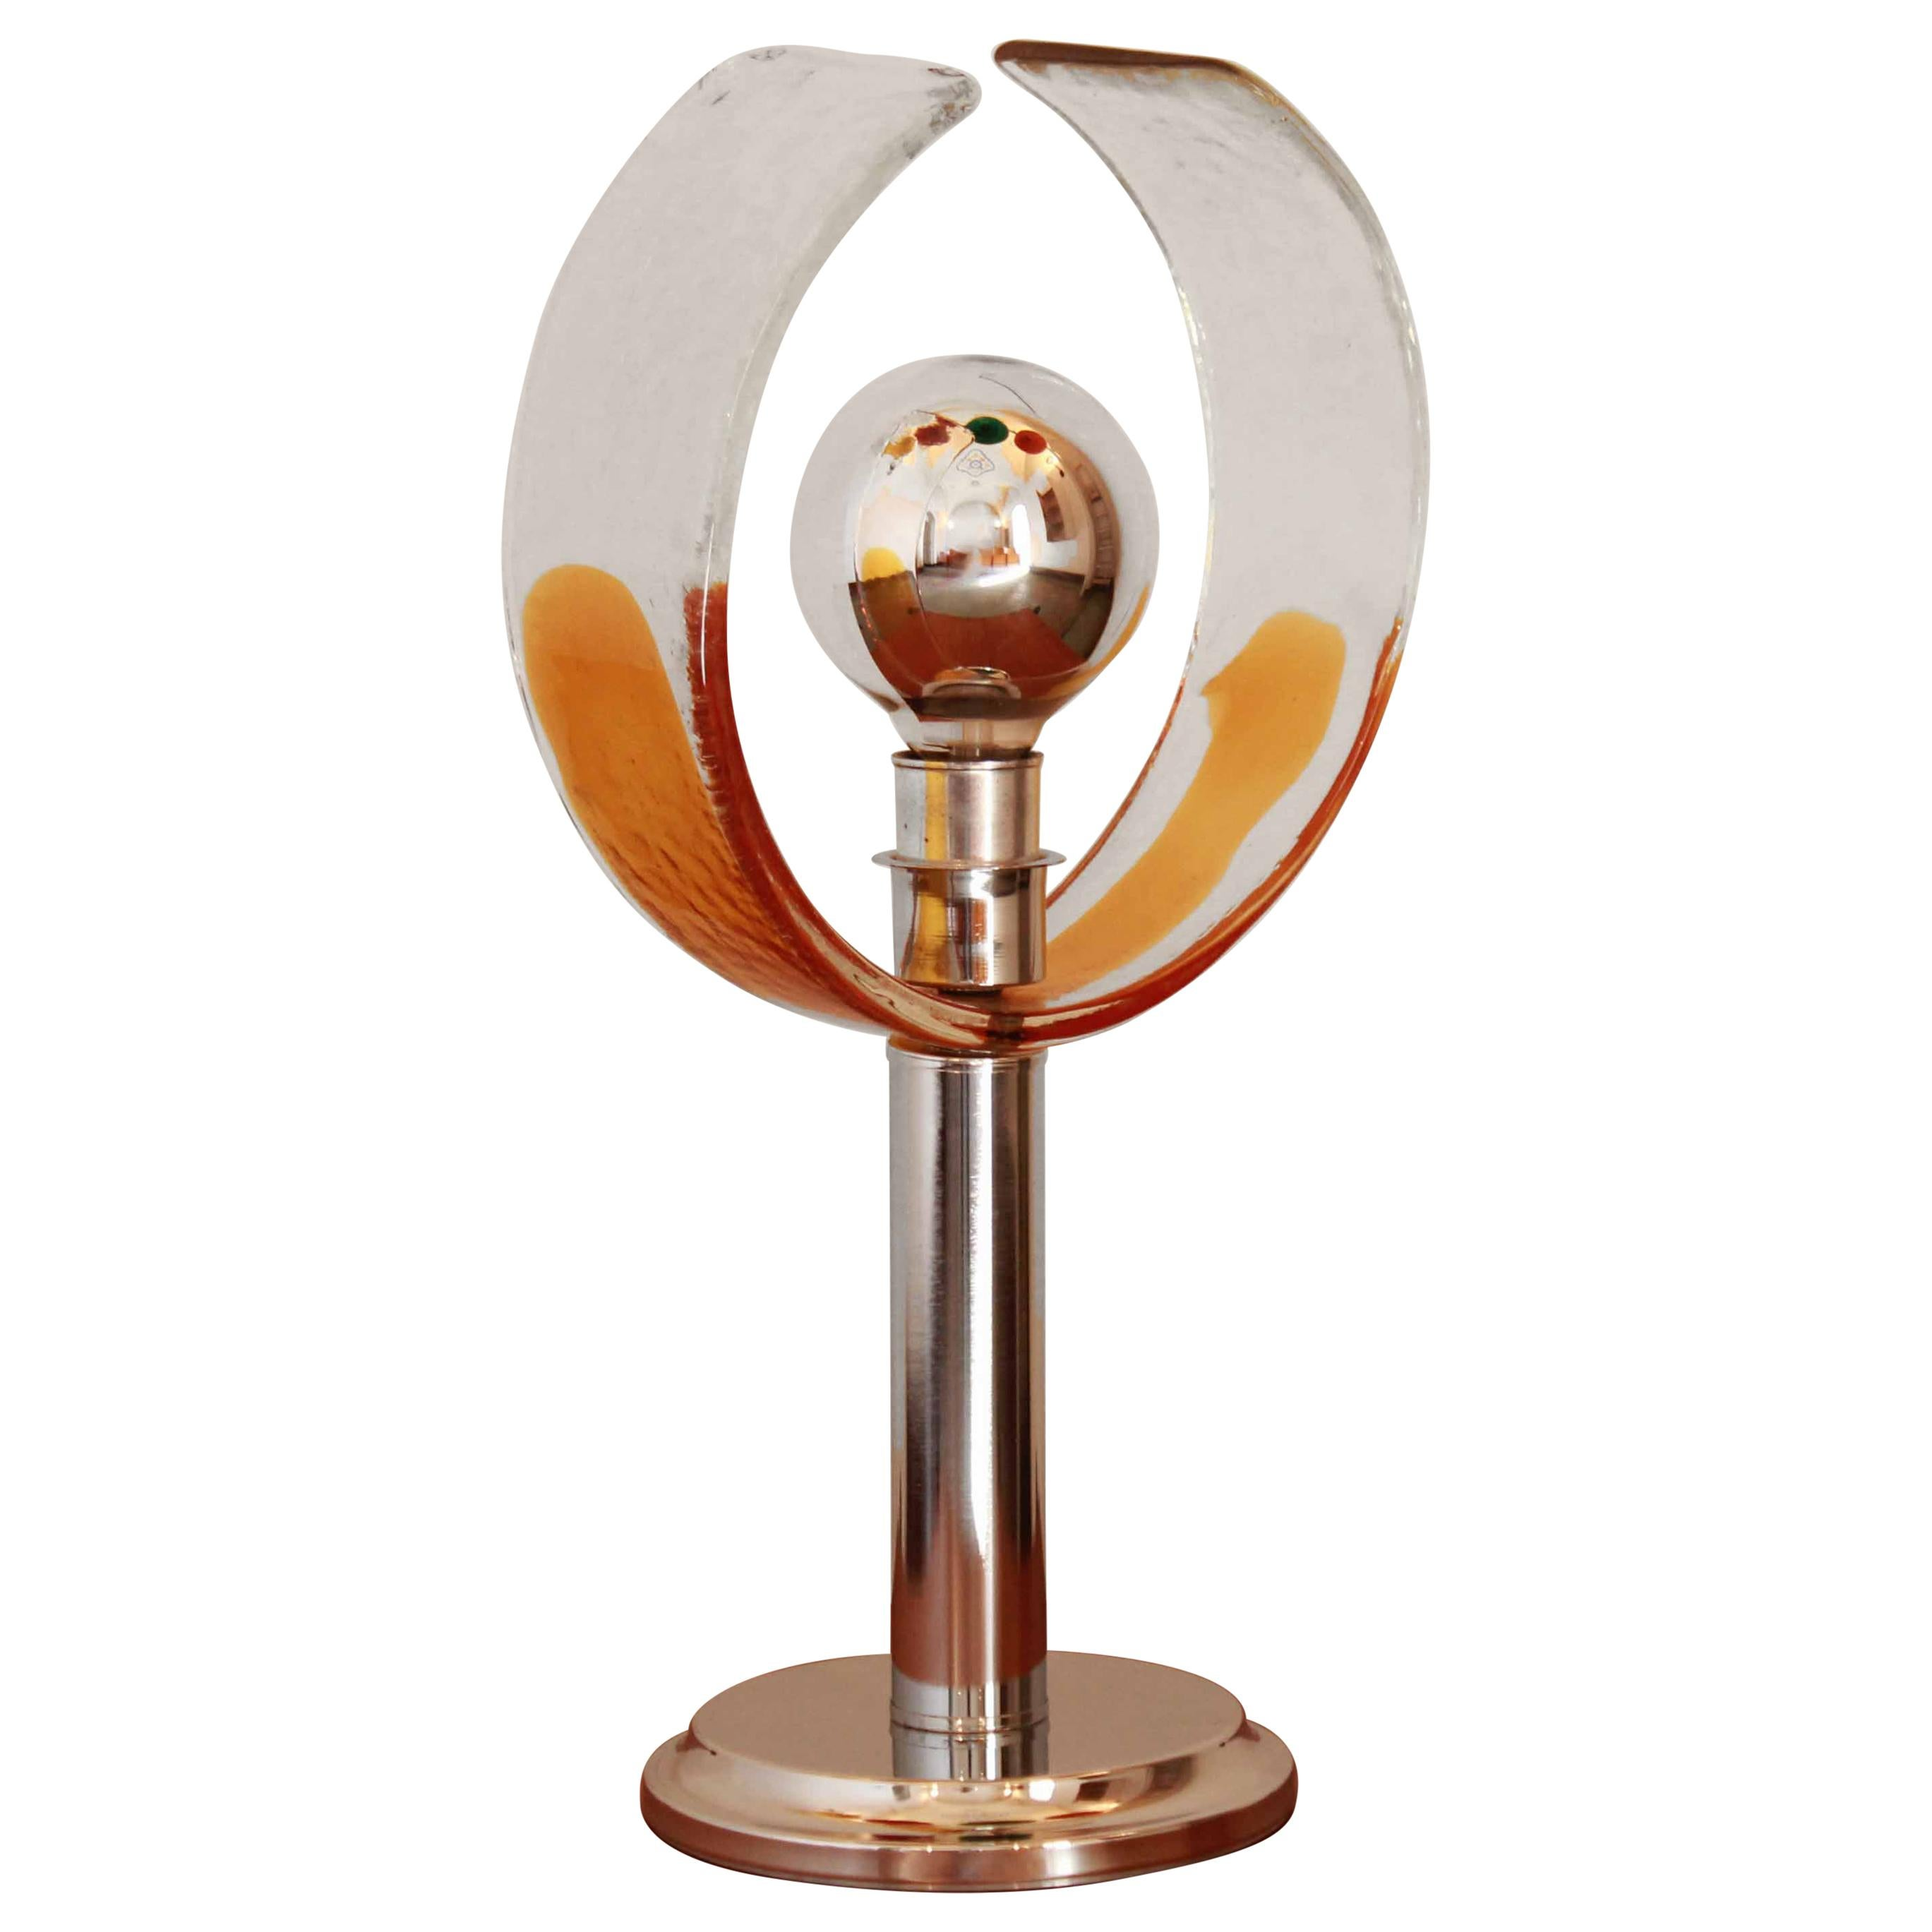 1970s Murano Glass Chrome Table Lamp by Carlo Nason for Mazzega